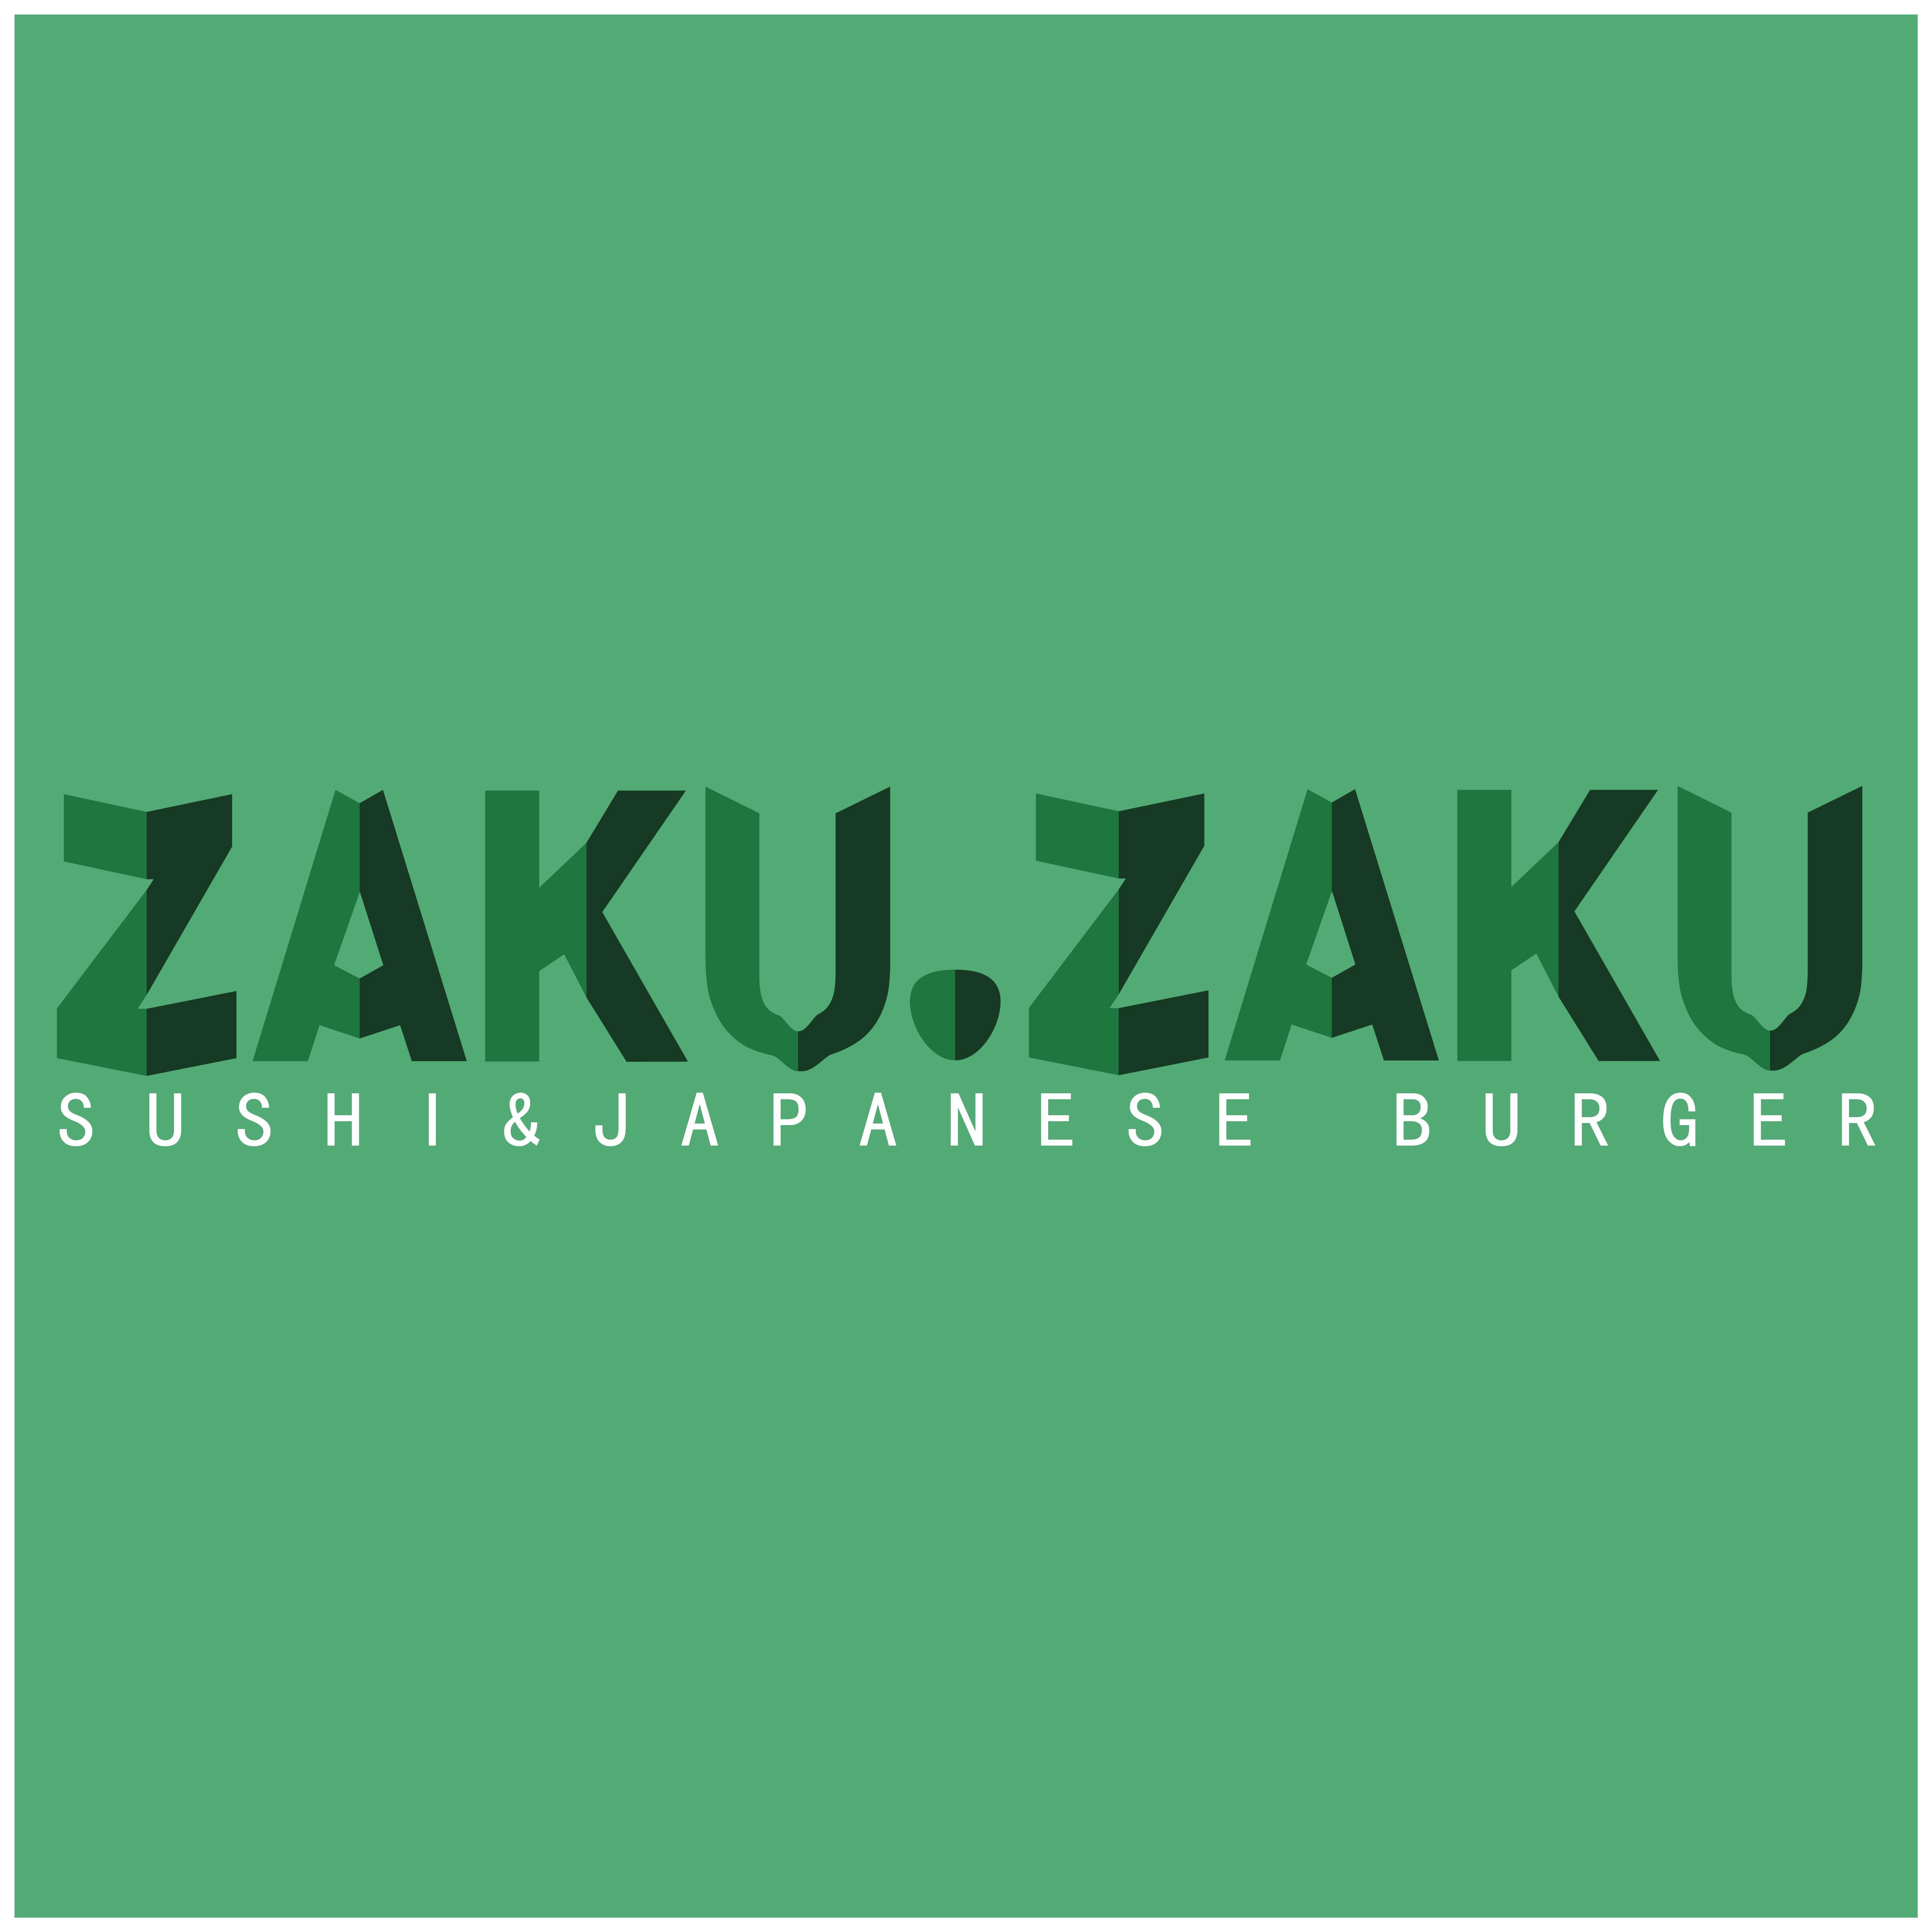 Zaku Zaku